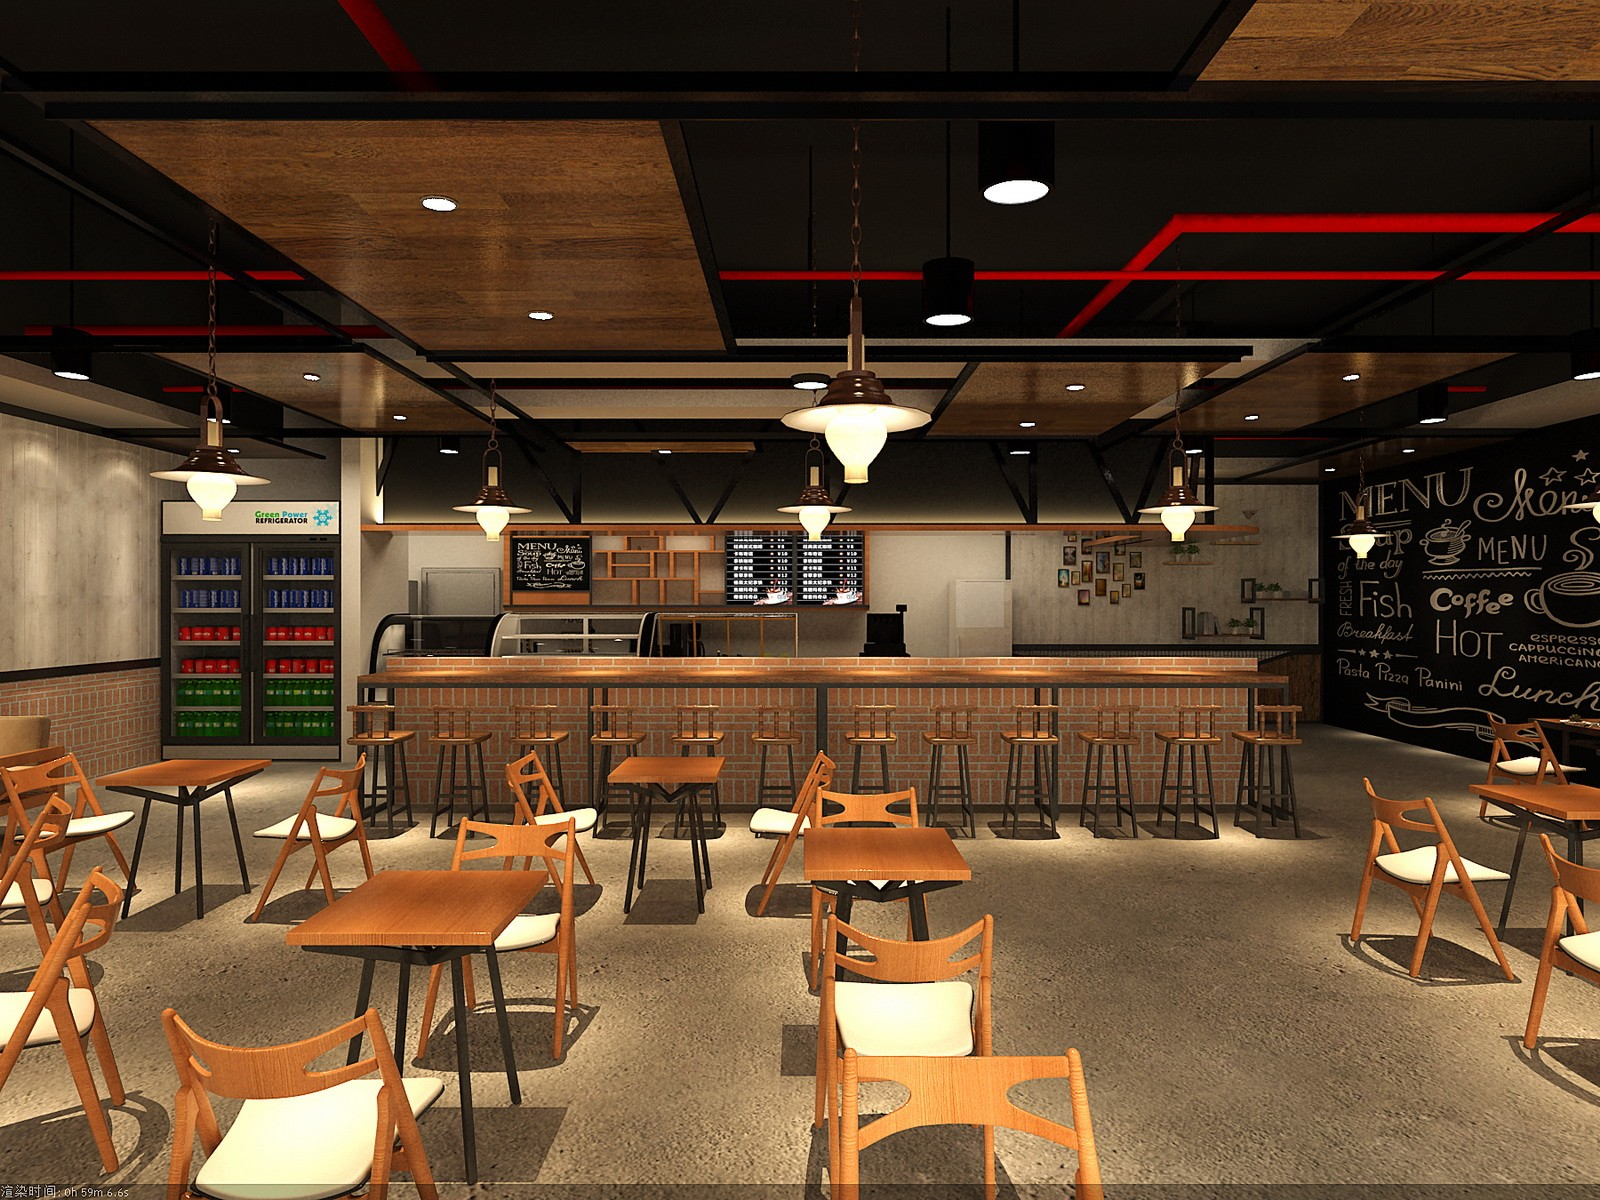 Coffee shop design, counter, display showcase